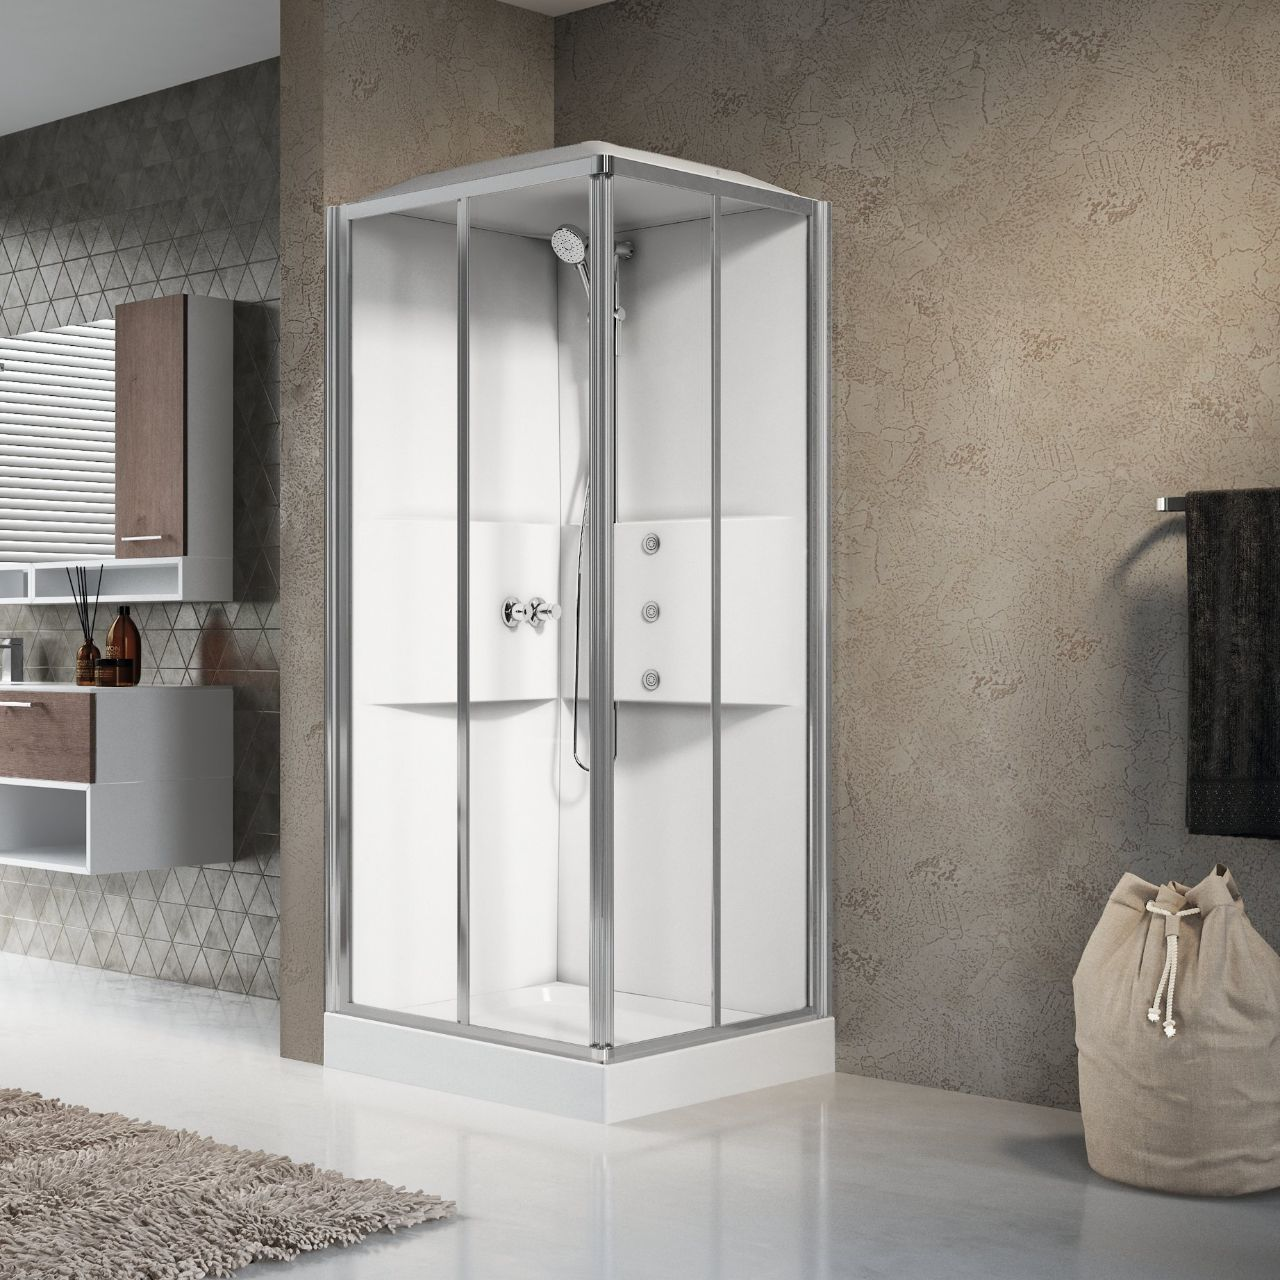 cabines de douche media 2 0 a80 novellini. Black Bedroom Furniture Sets. Home Design Ideas